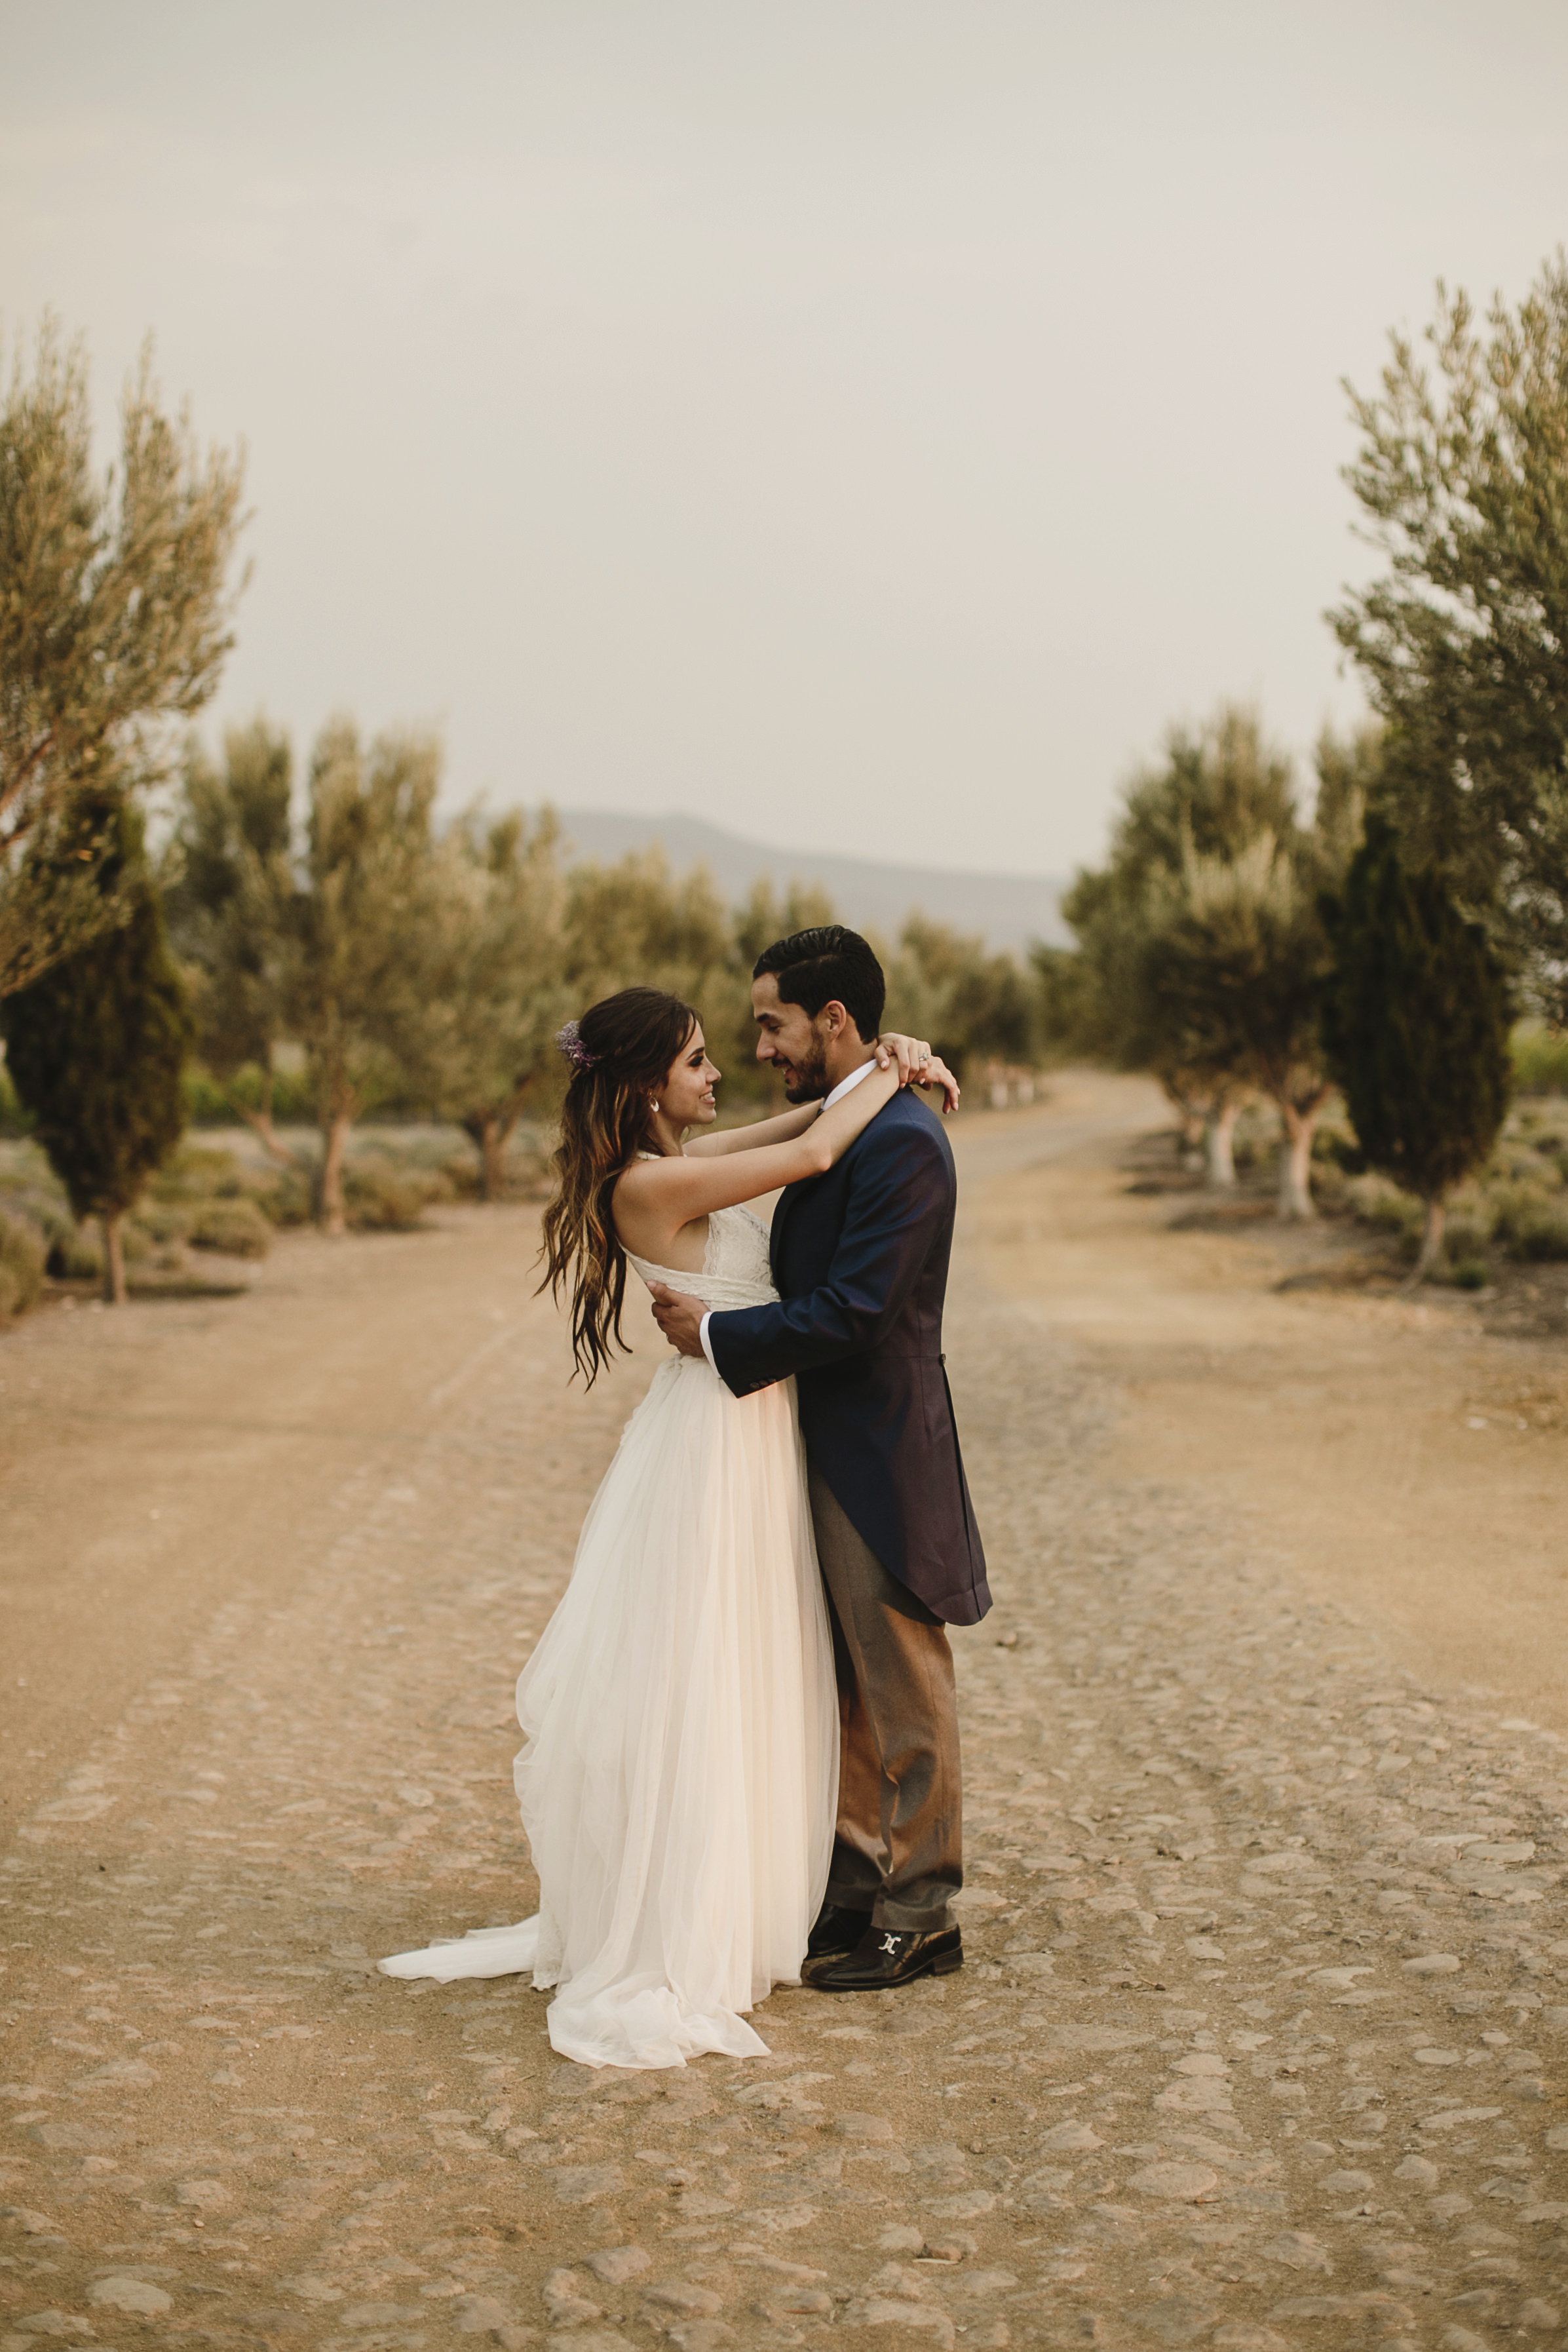 alfons_flores_destination_wedding_photography_mavi_david-1849.JPG